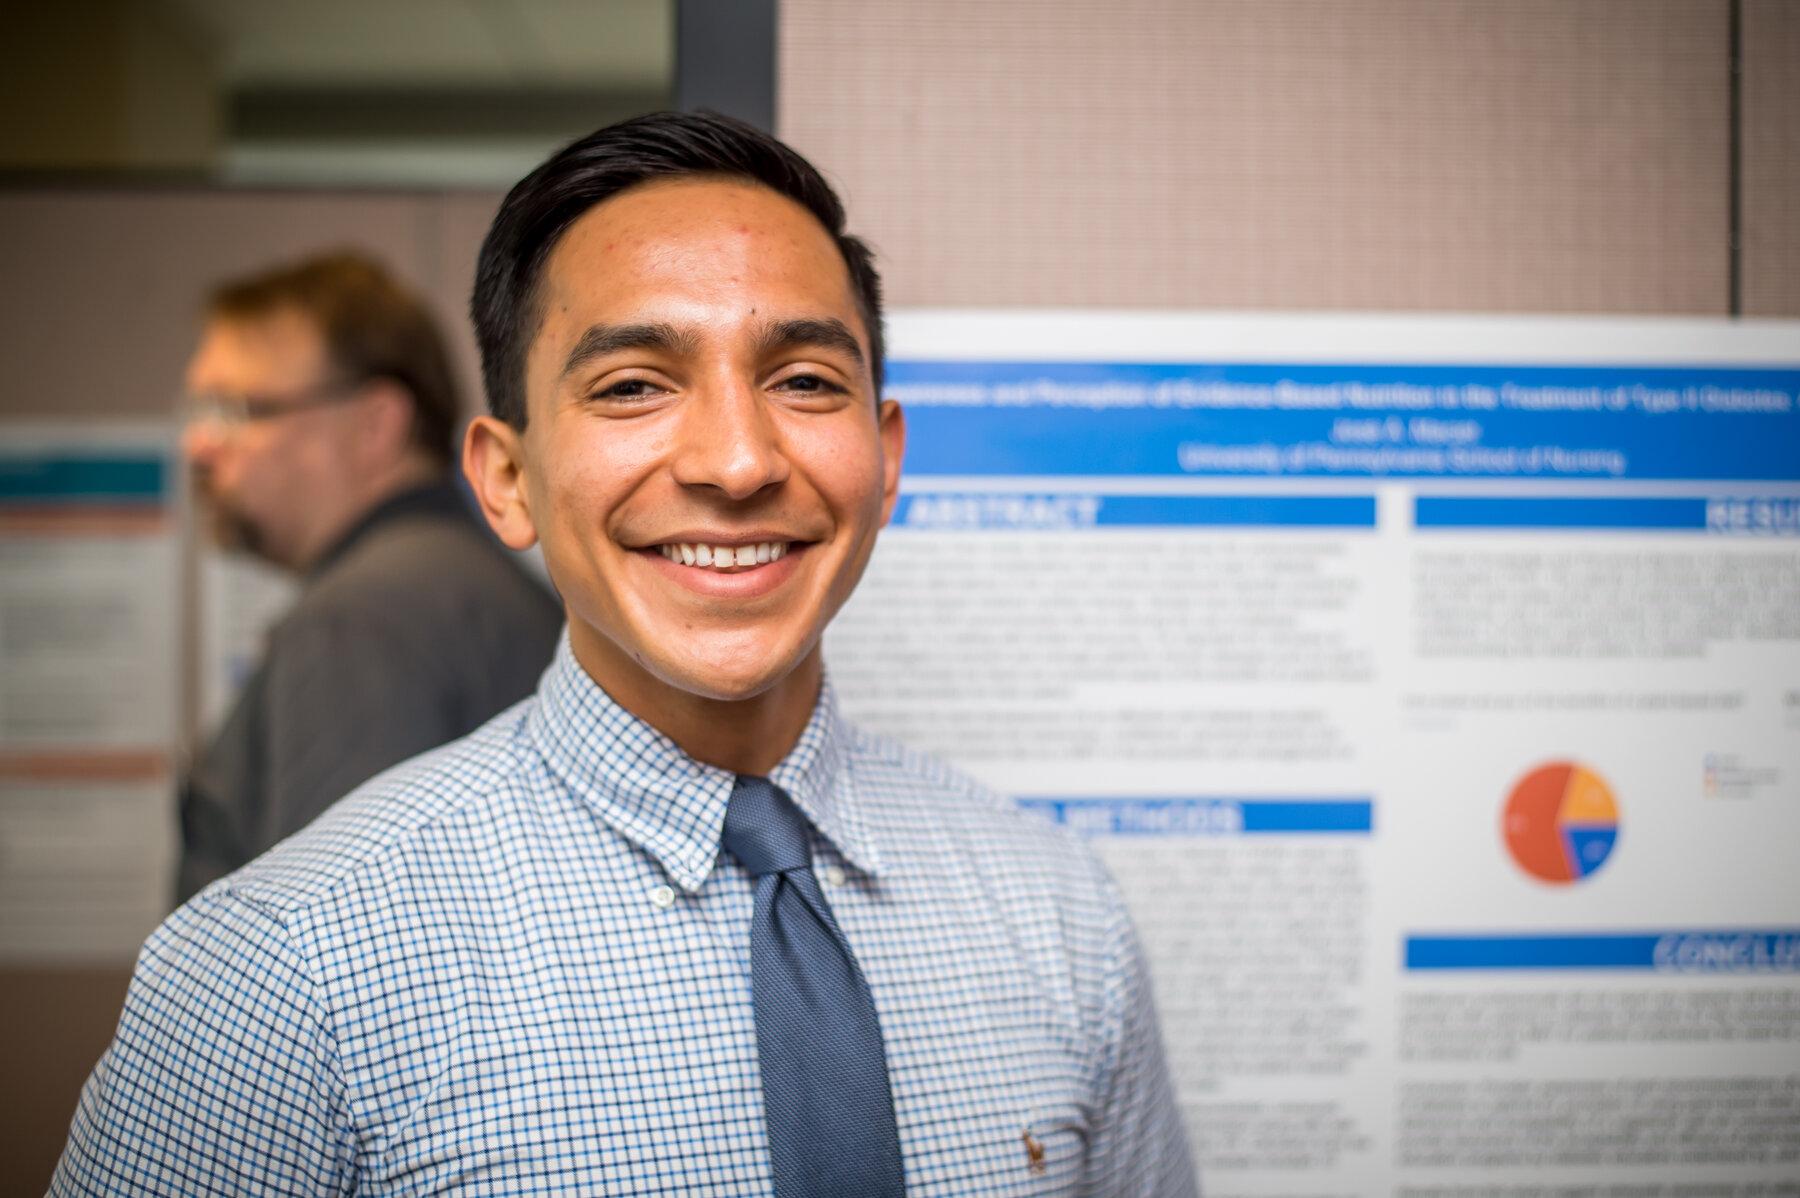 Jose Poster Presentation, Nursing Internship Program Recognition Event, Aug. 3, 2018